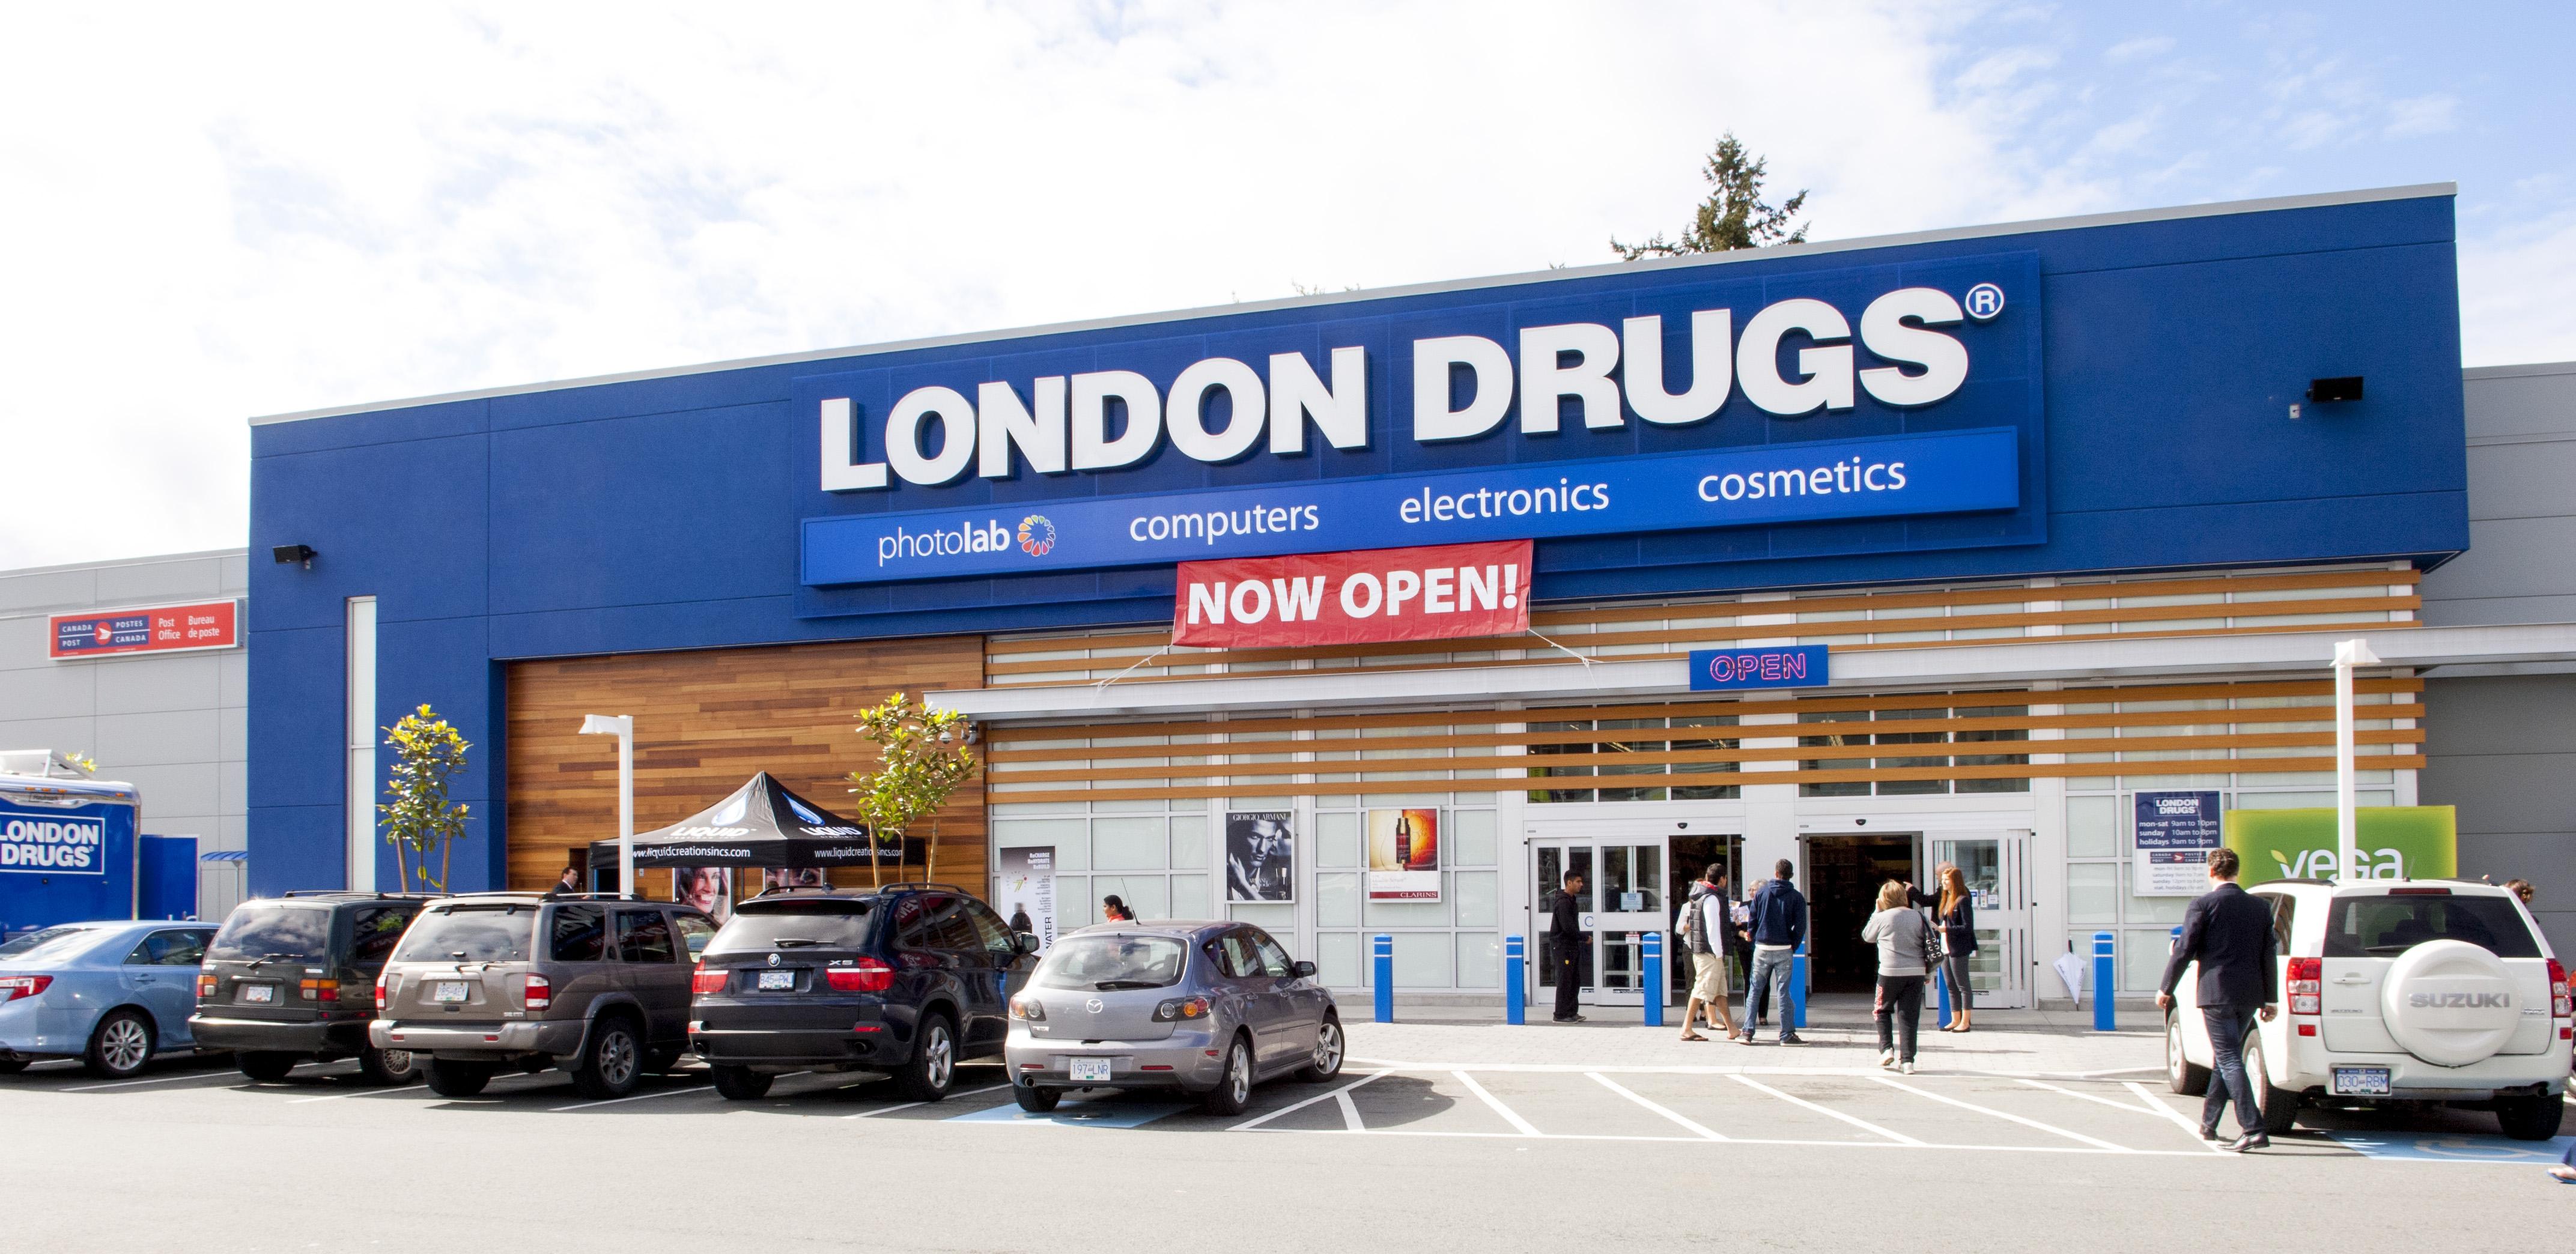 London Drugs - Wikipedia